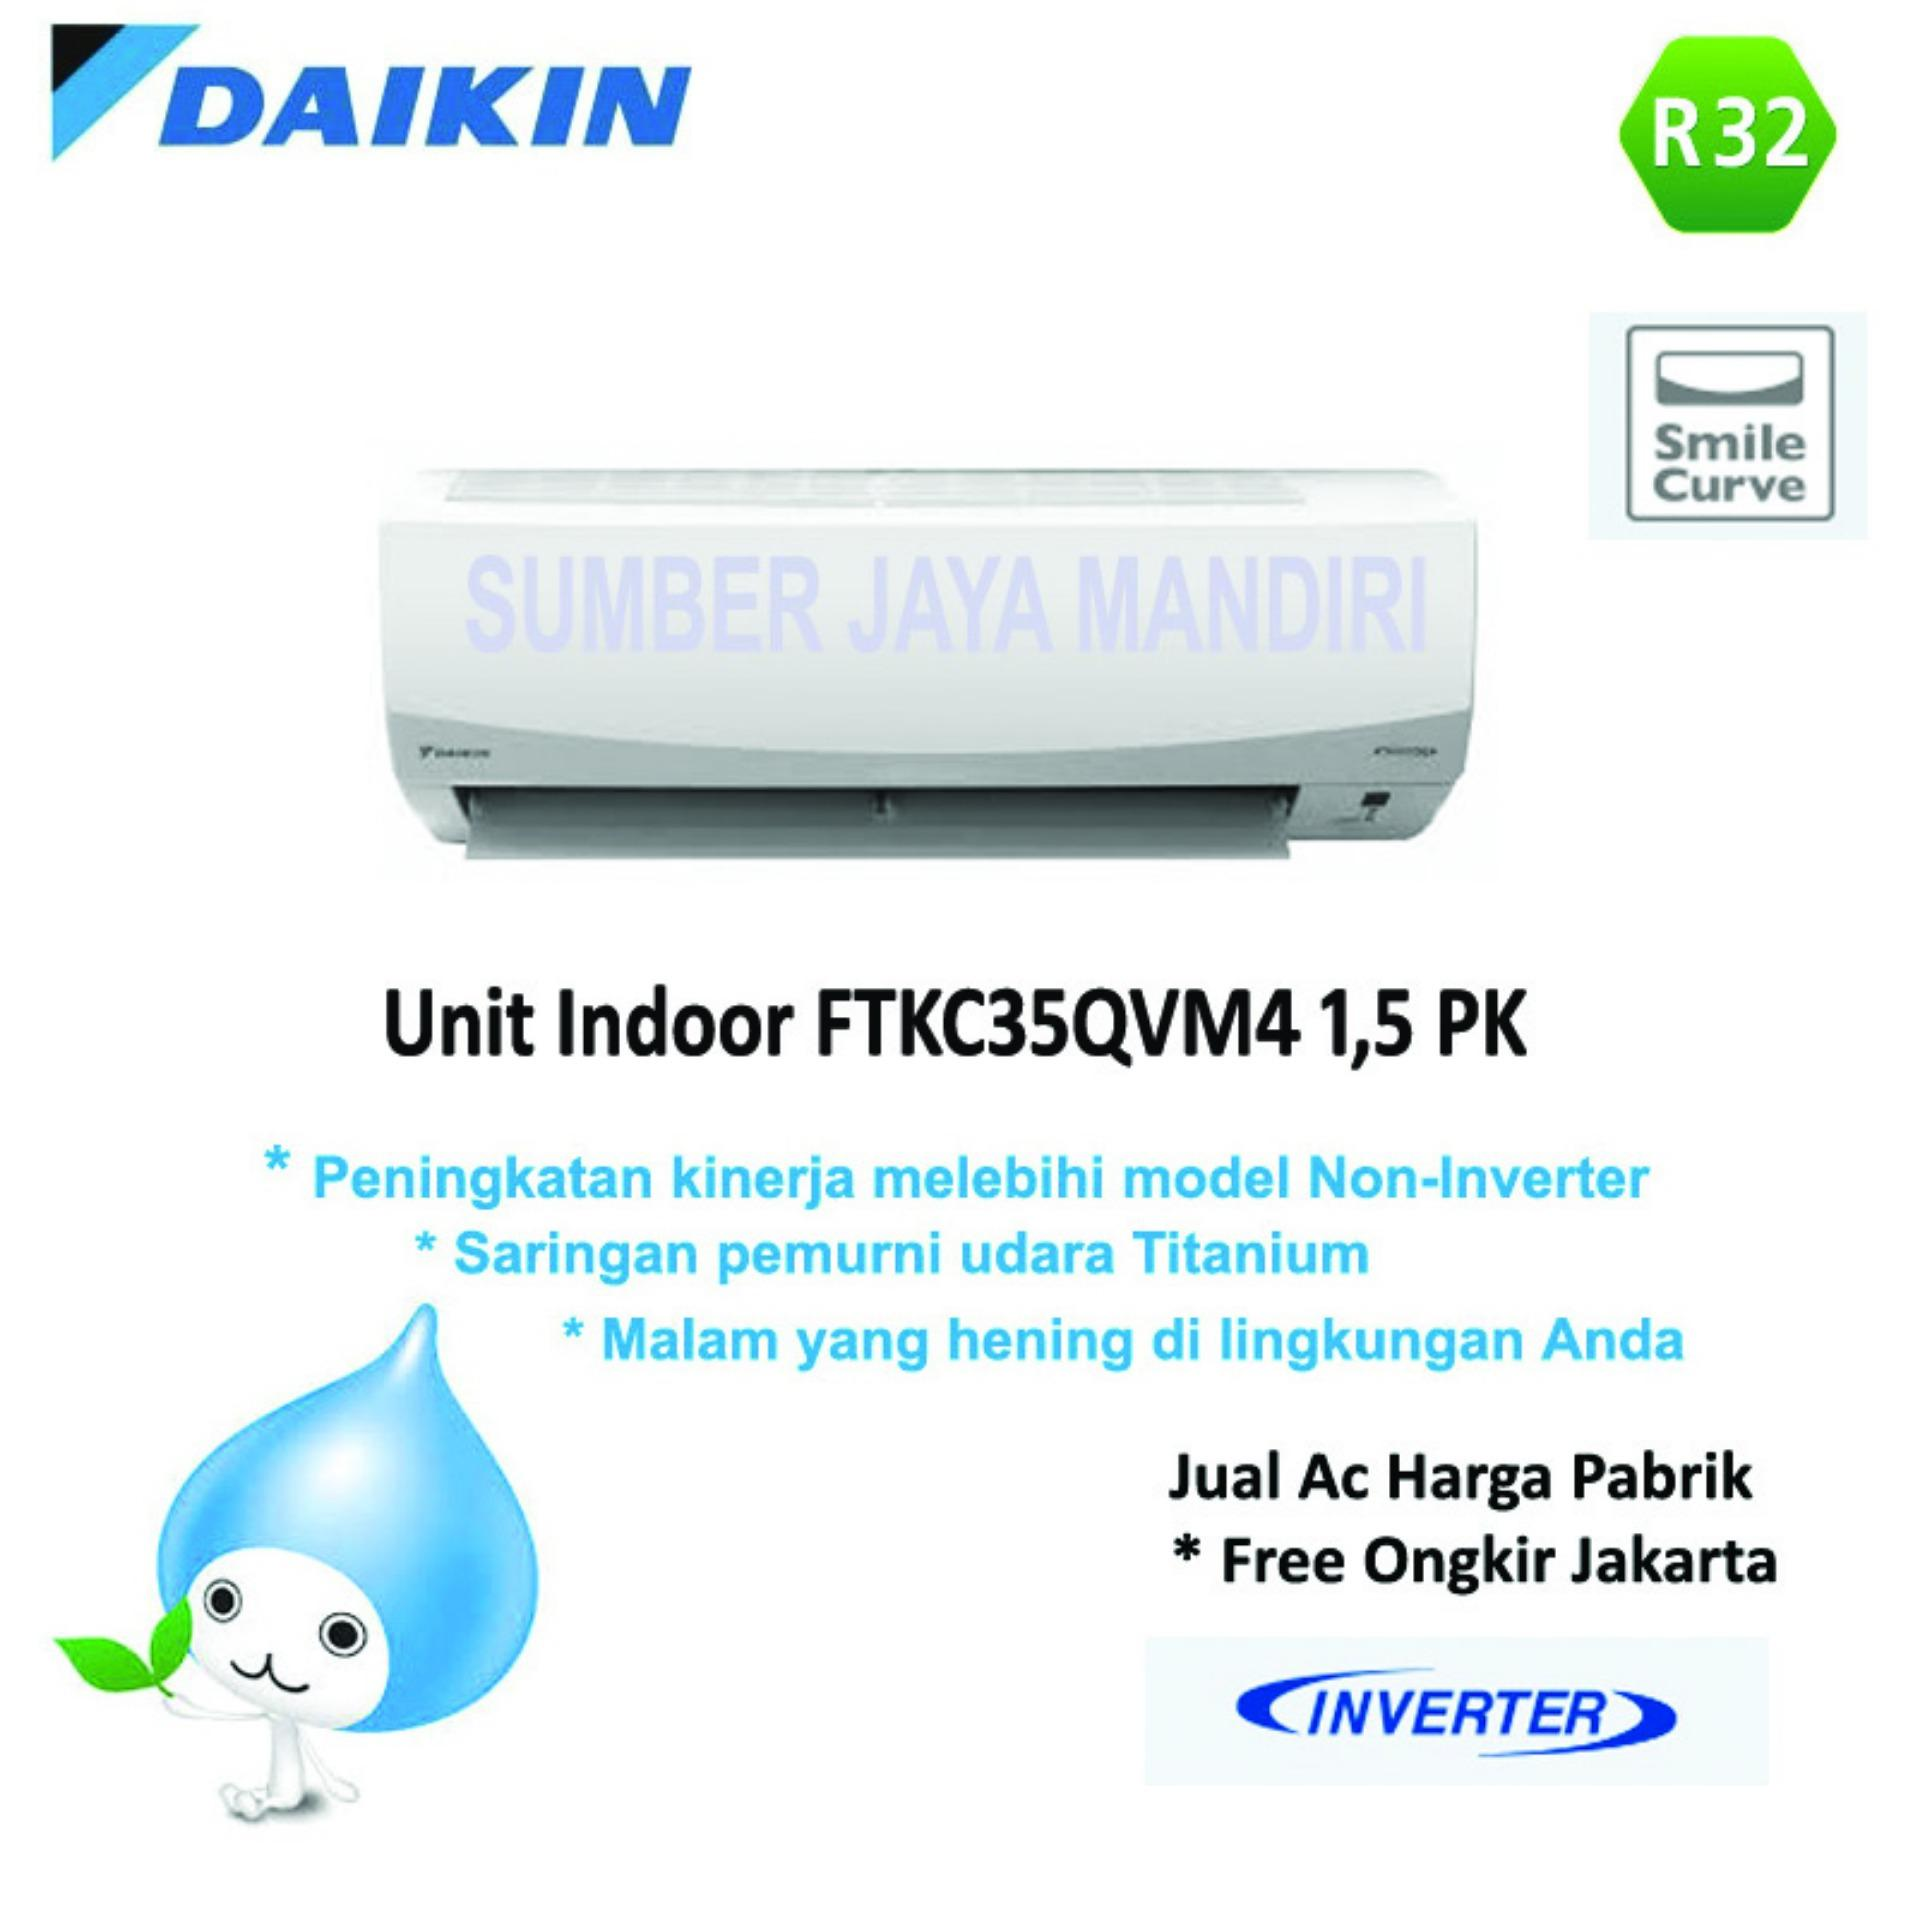 Ac Daikin Split FTKC35QVM4 1,5 PK (INVERTER) - Putih